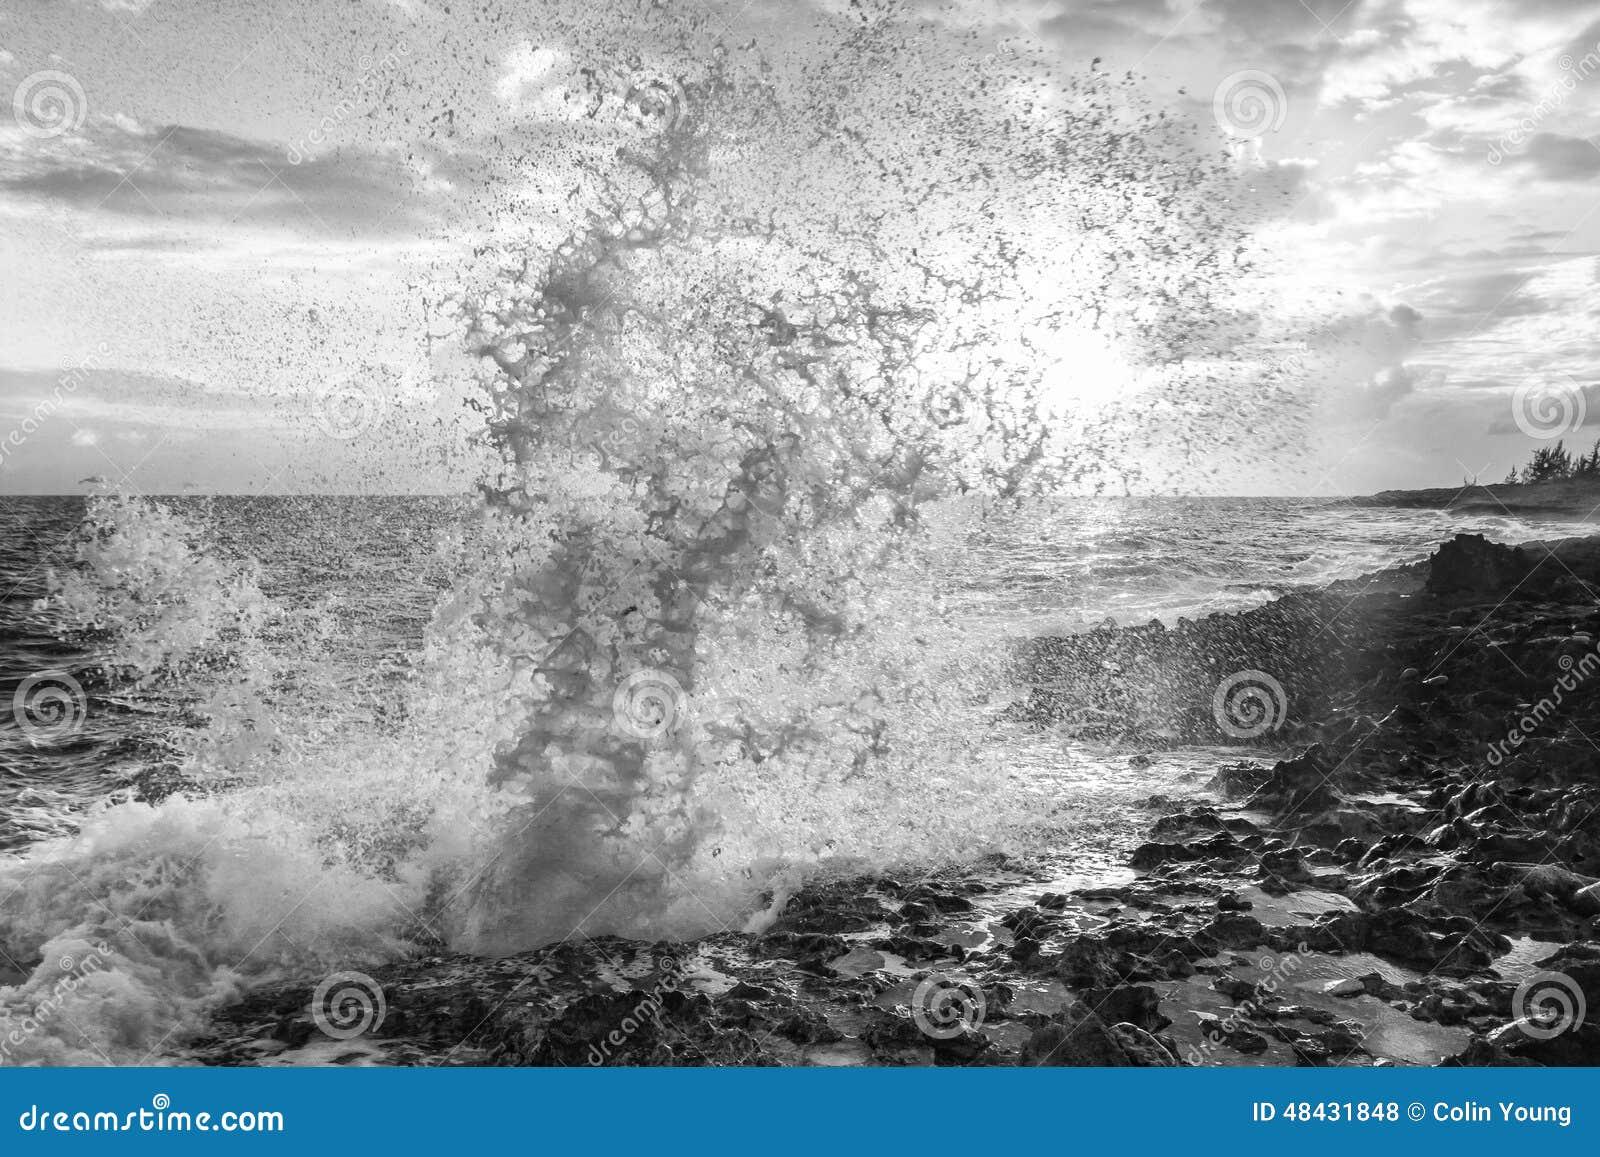 Grand Cayman Blow Hole Sunlit Spray